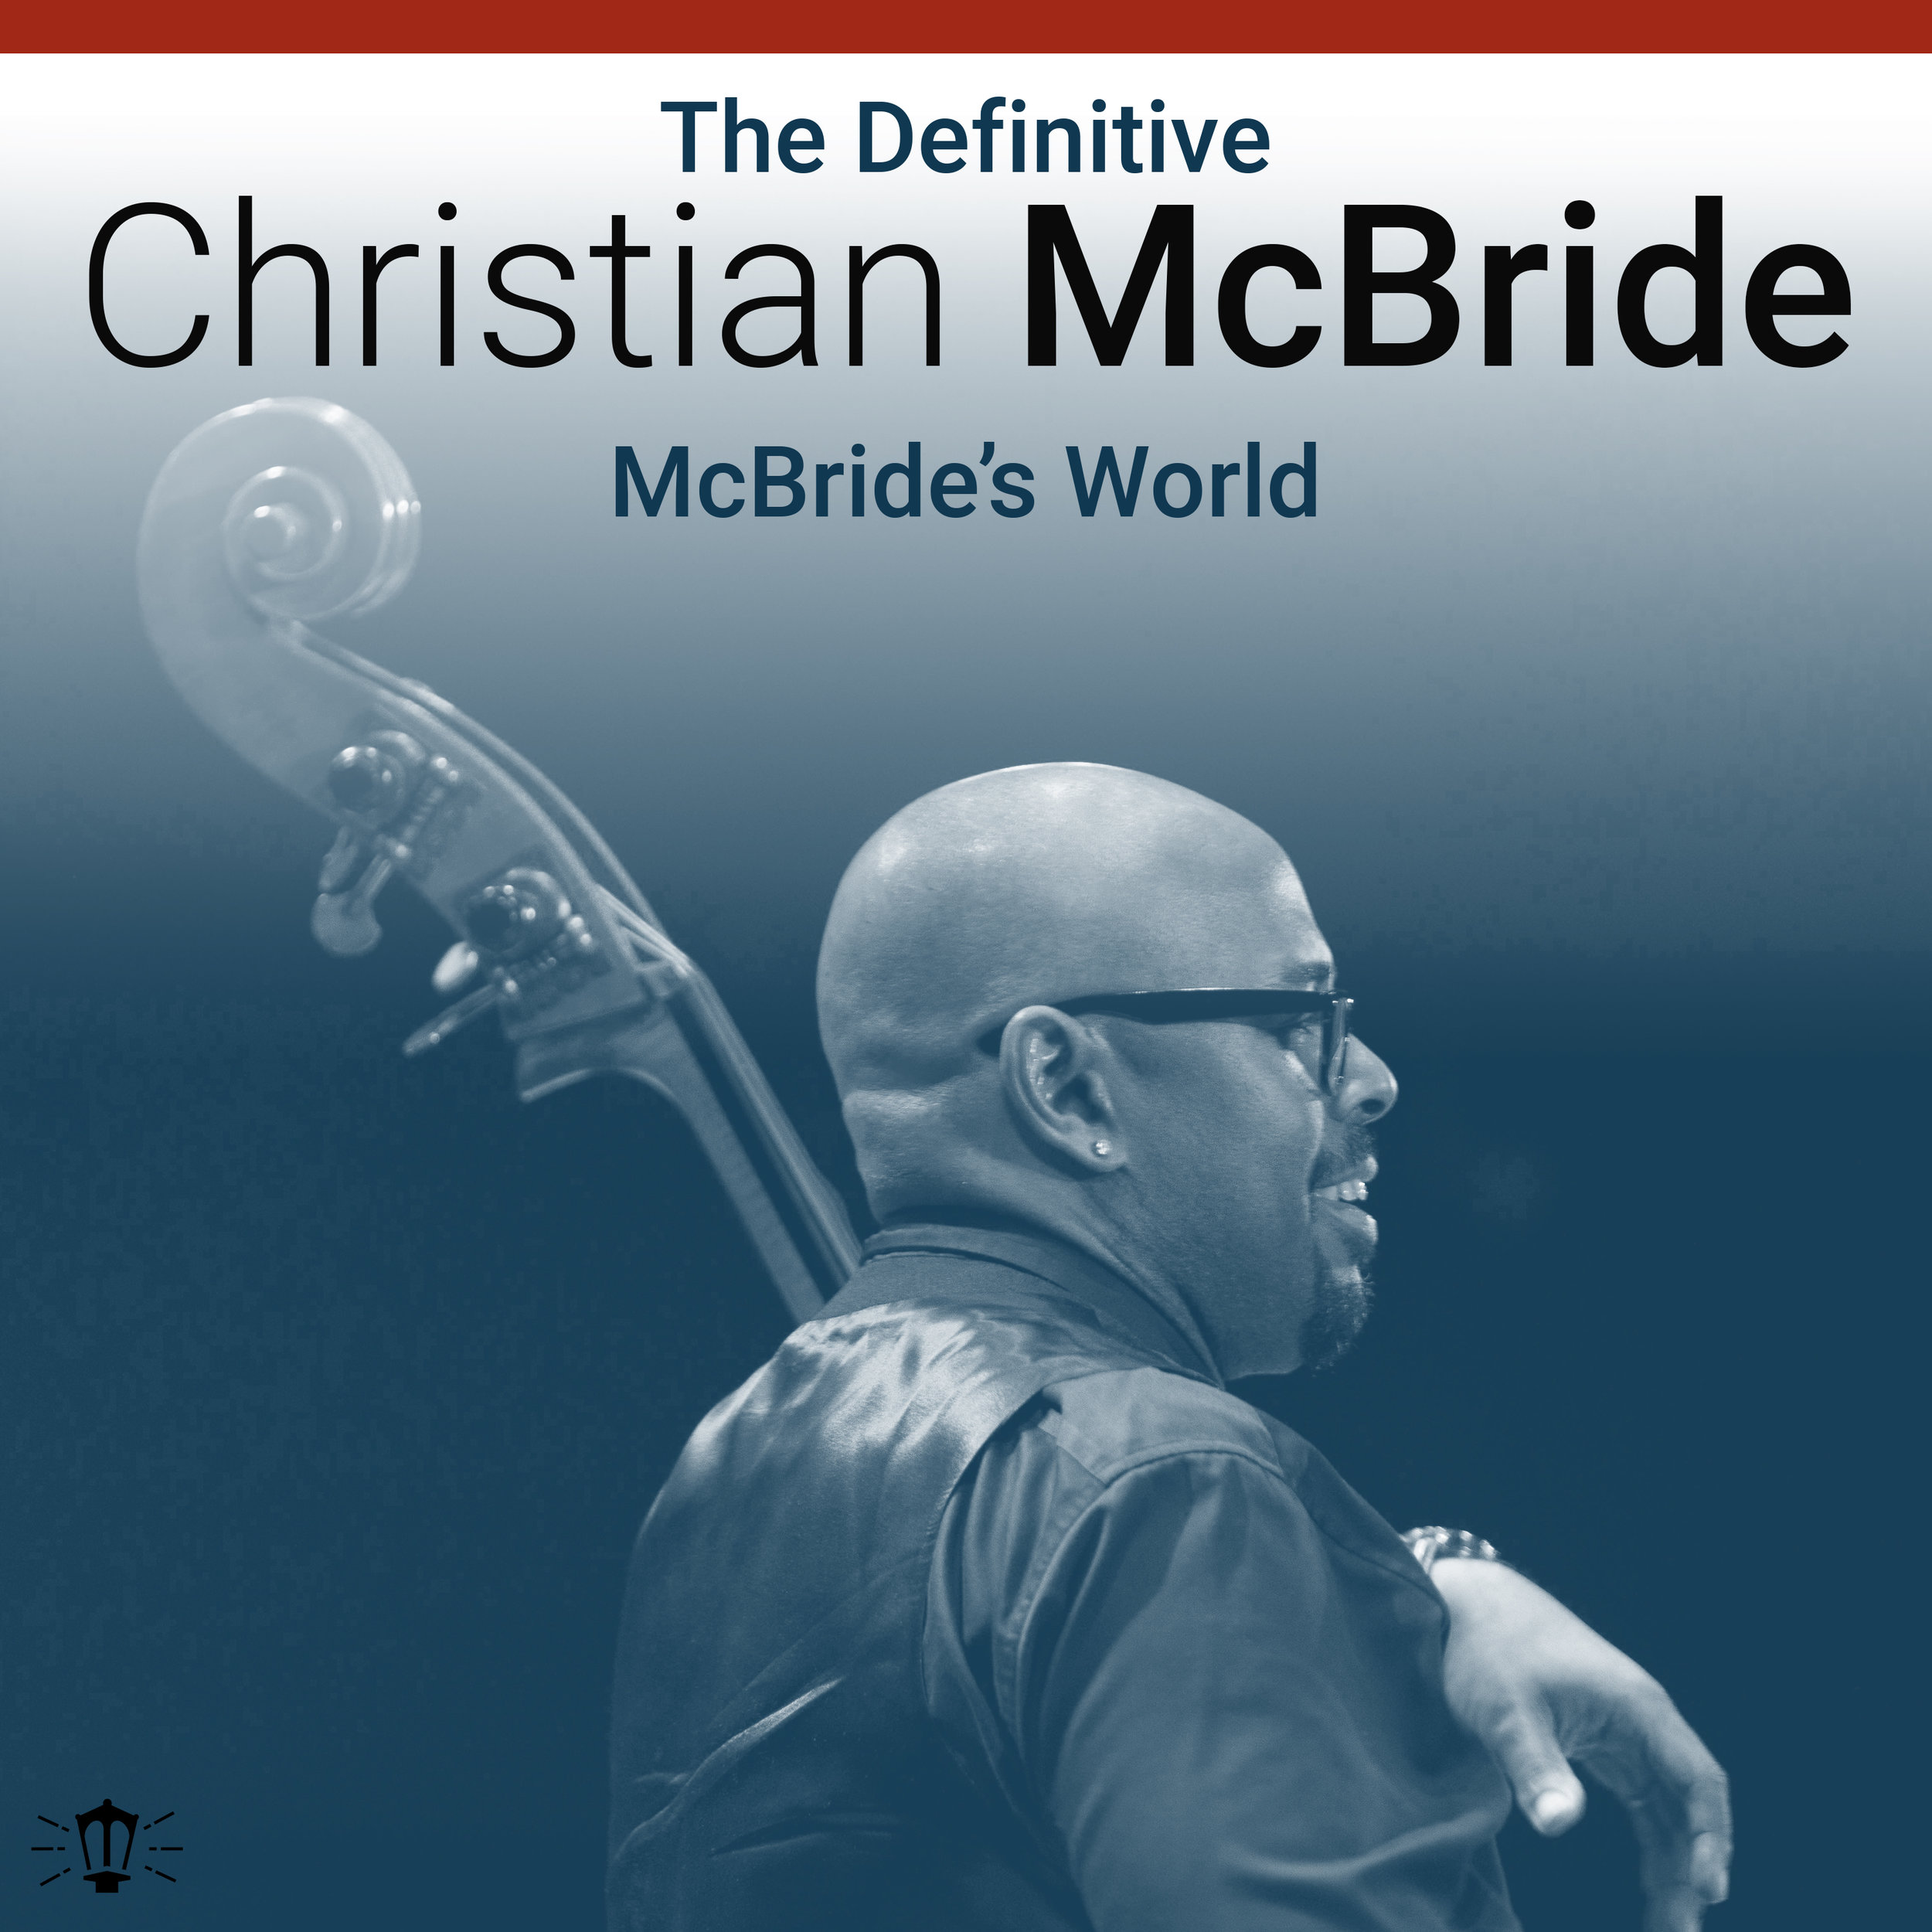 Definitive Christian McBride